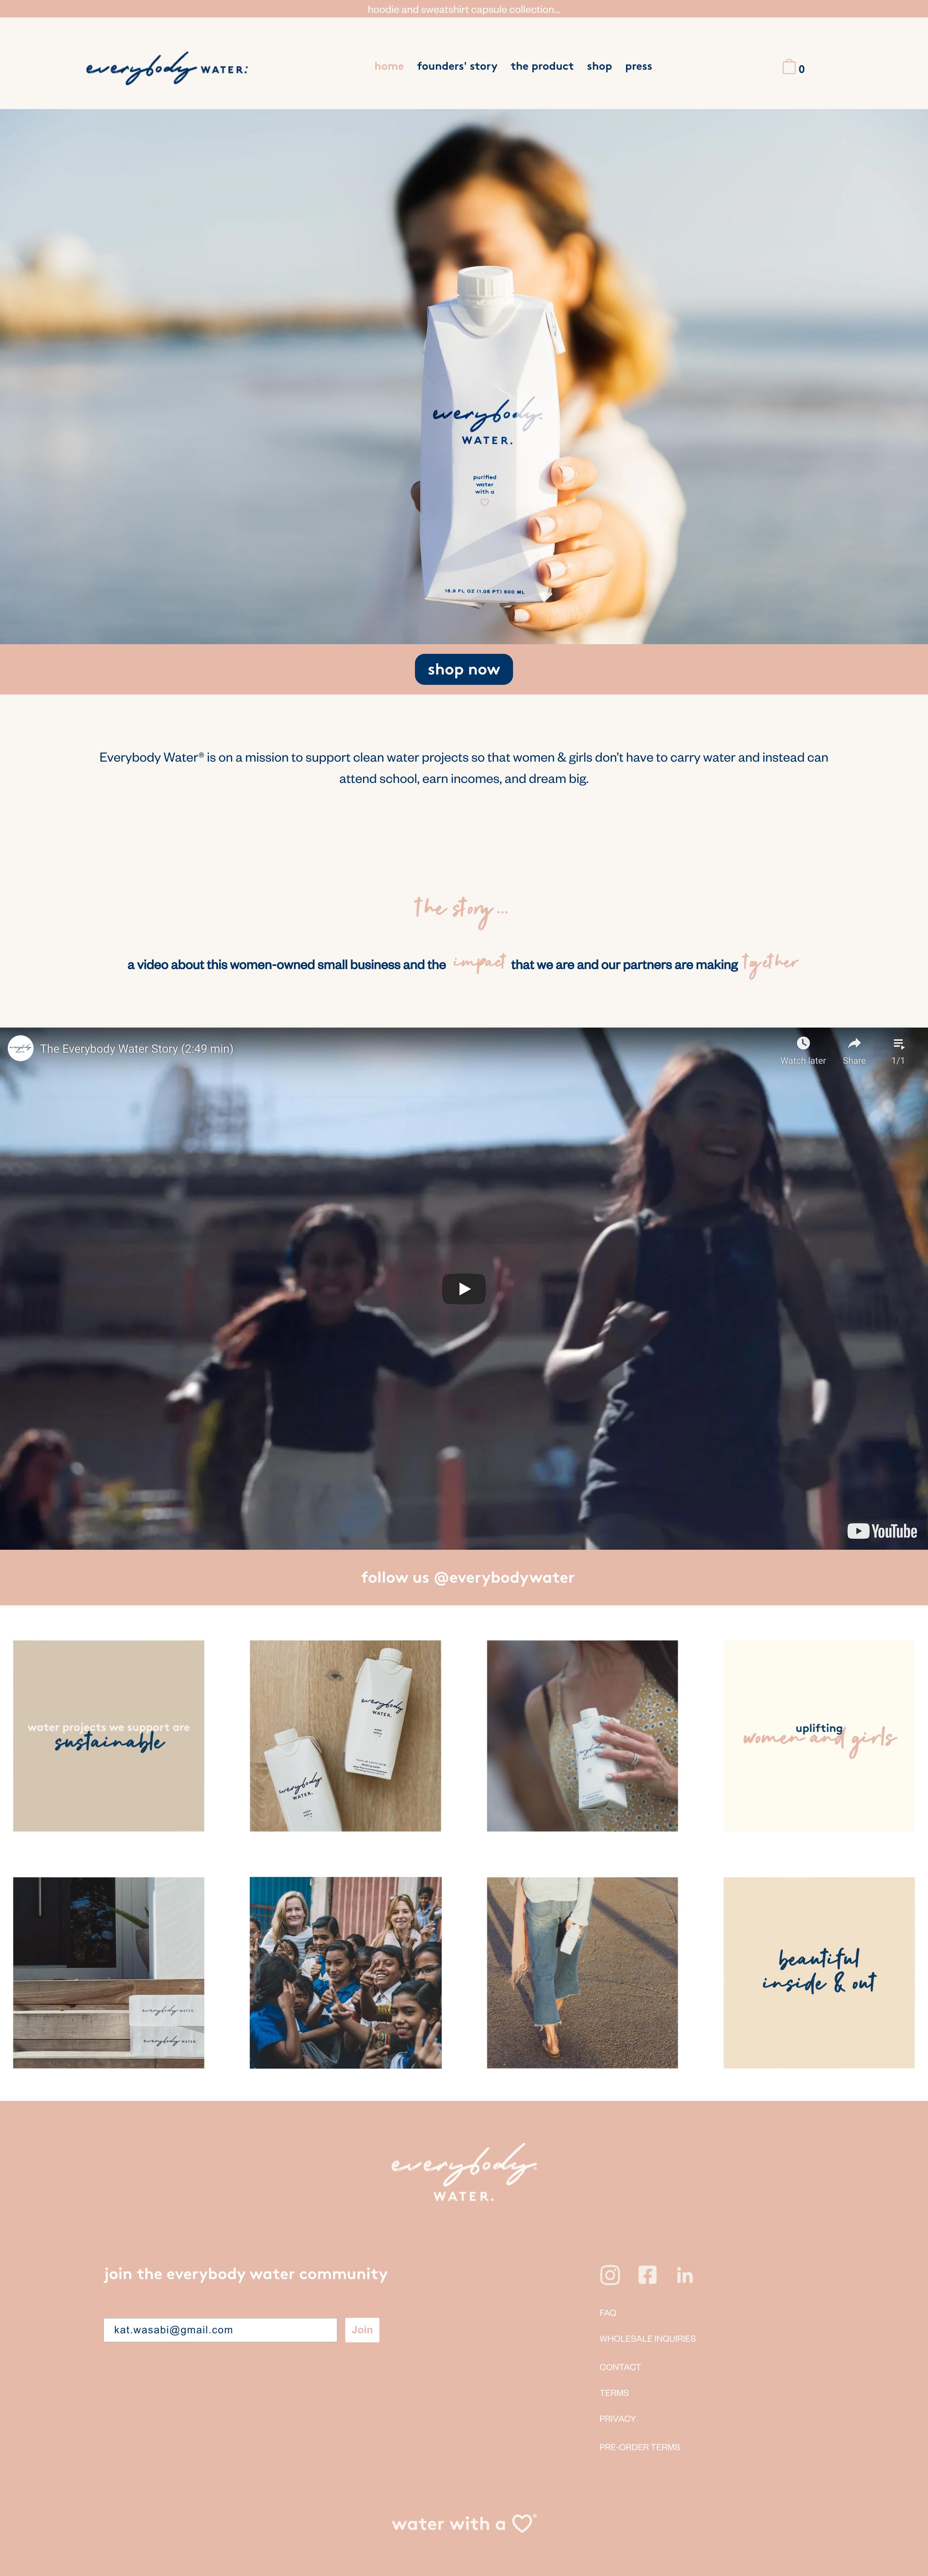 everybody water website screenshot